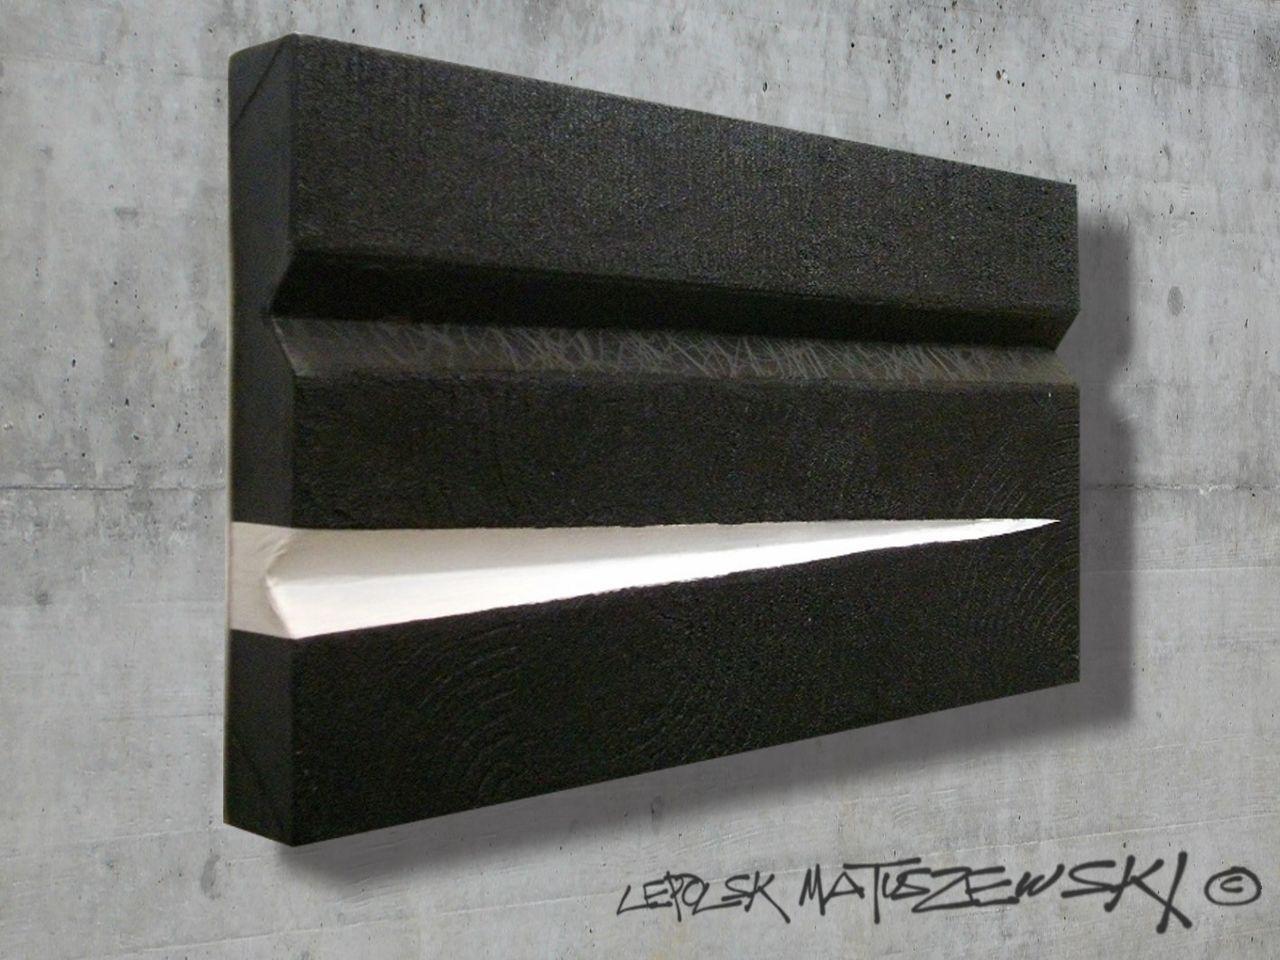 MISTER K  (Lepolsk Matuszewski) PROTOTYPE 60     abstract expressionism